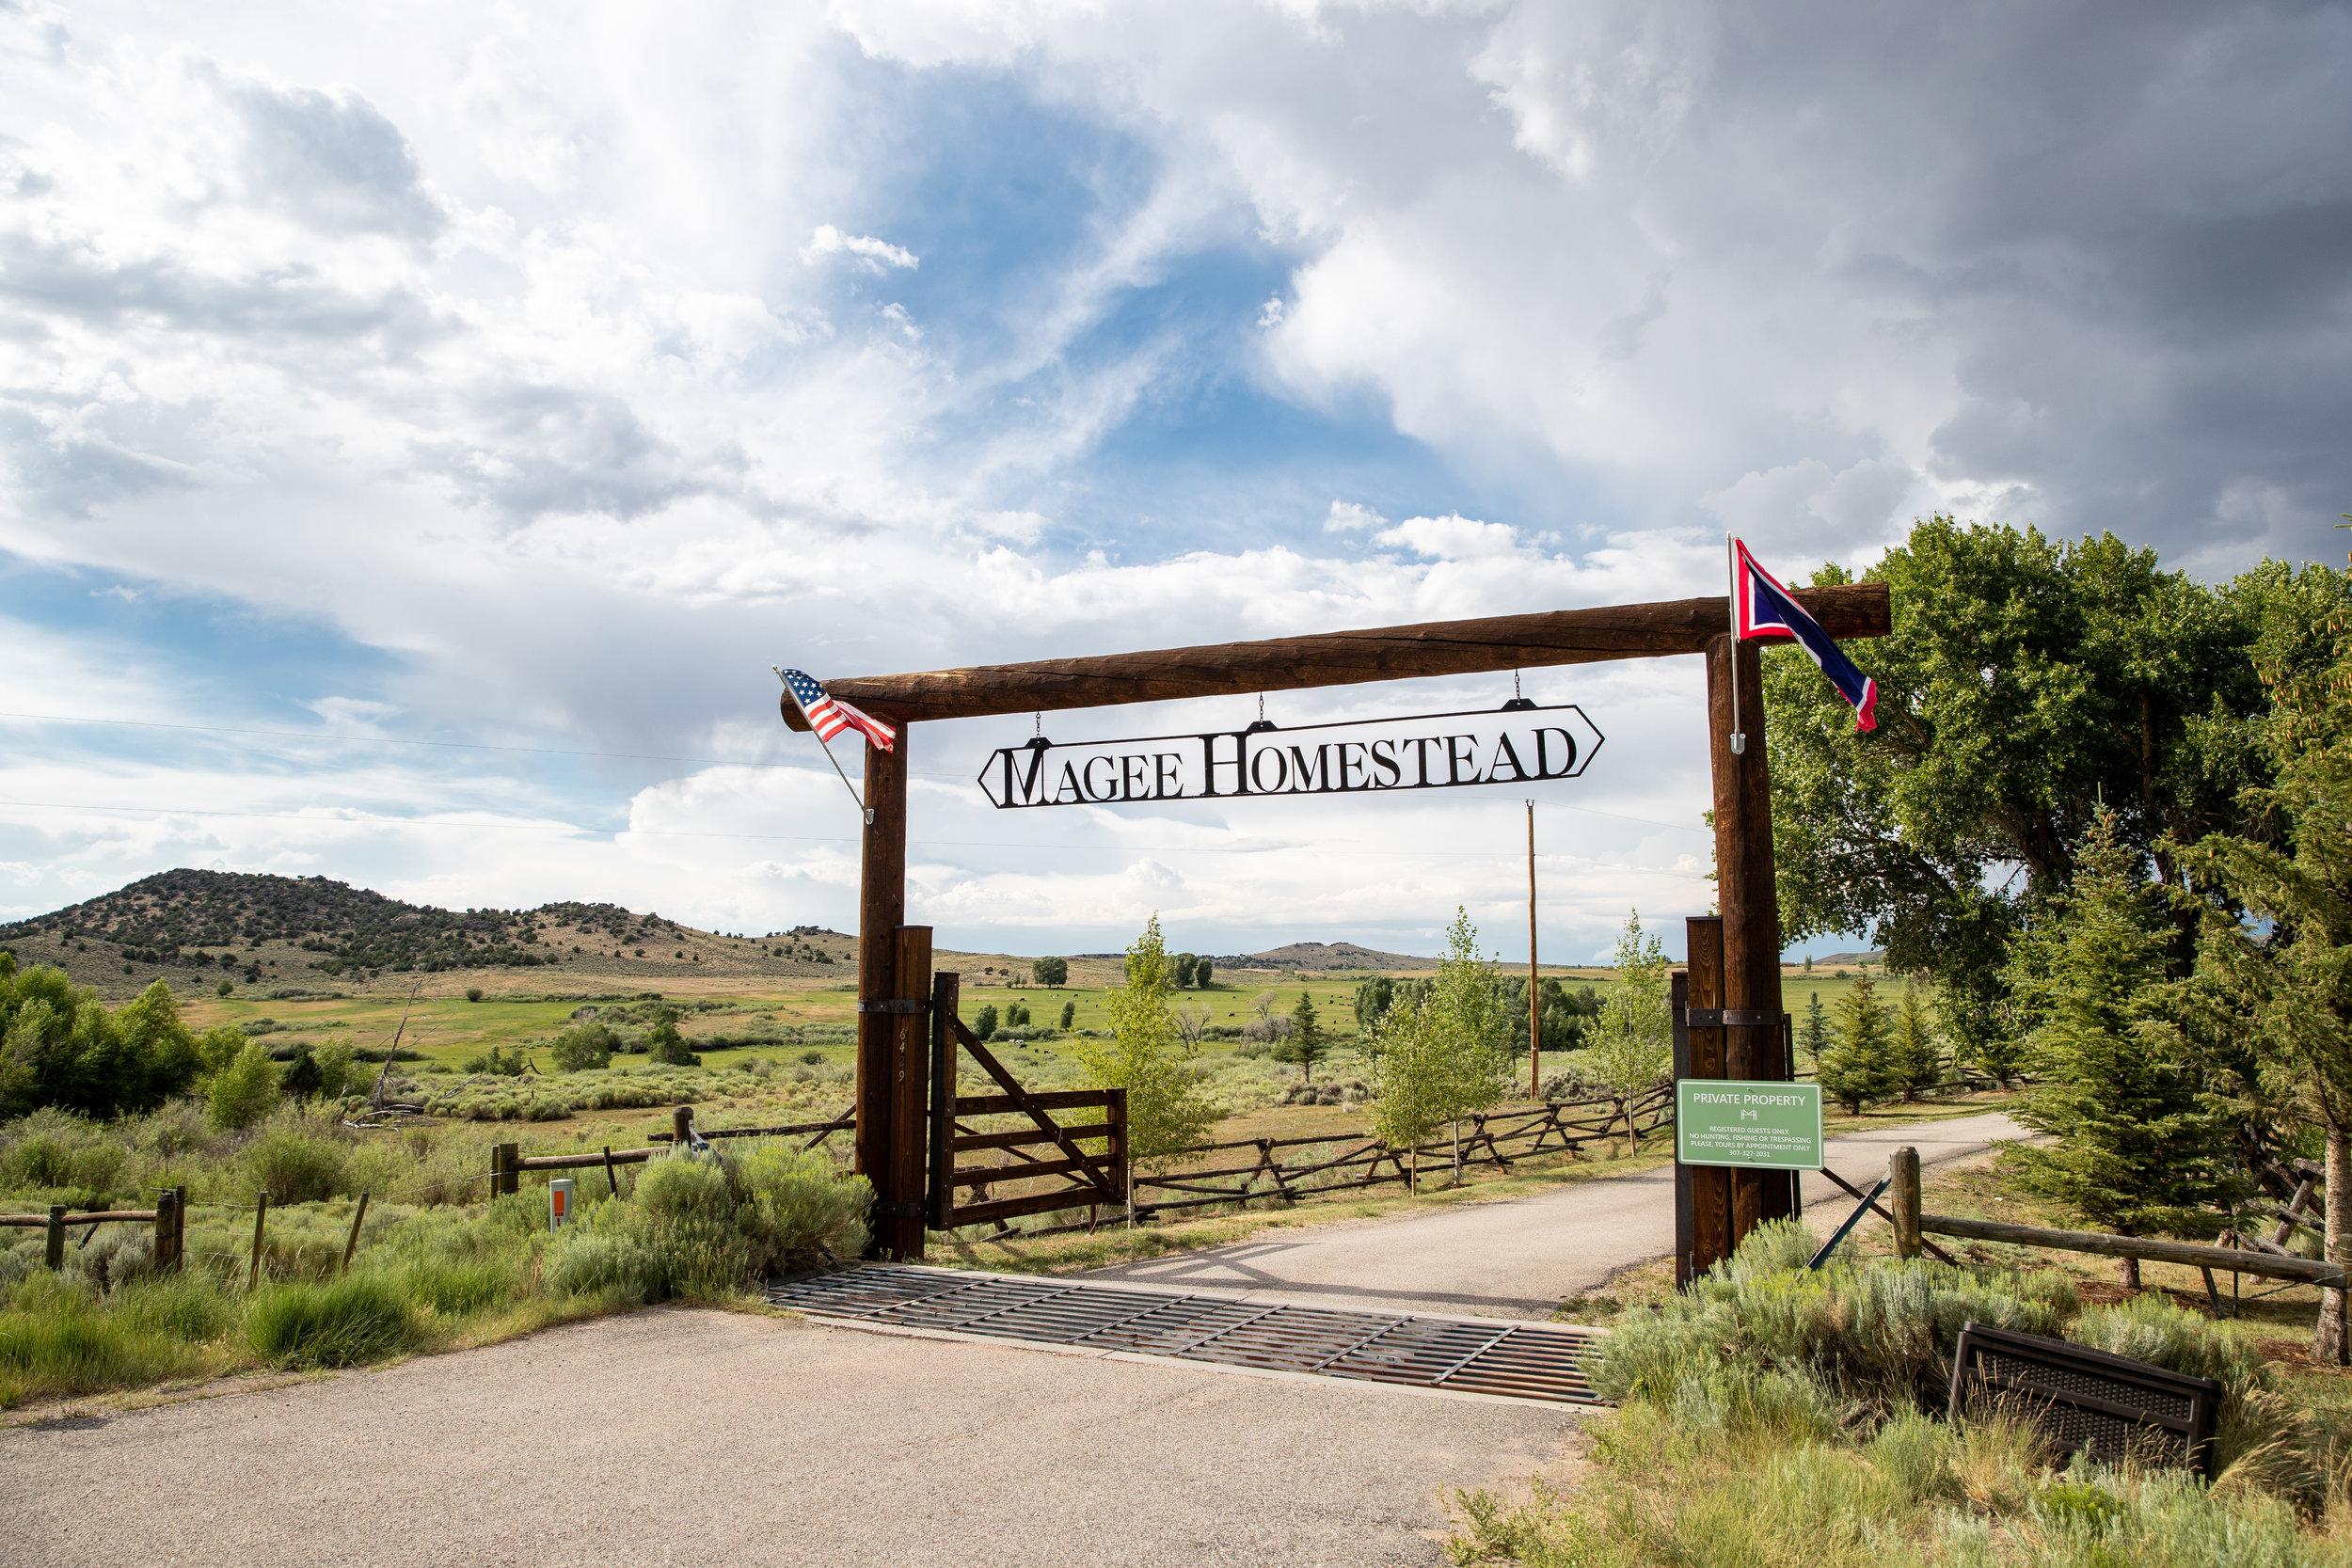 Magee Homestead at Brush Creek Ranch